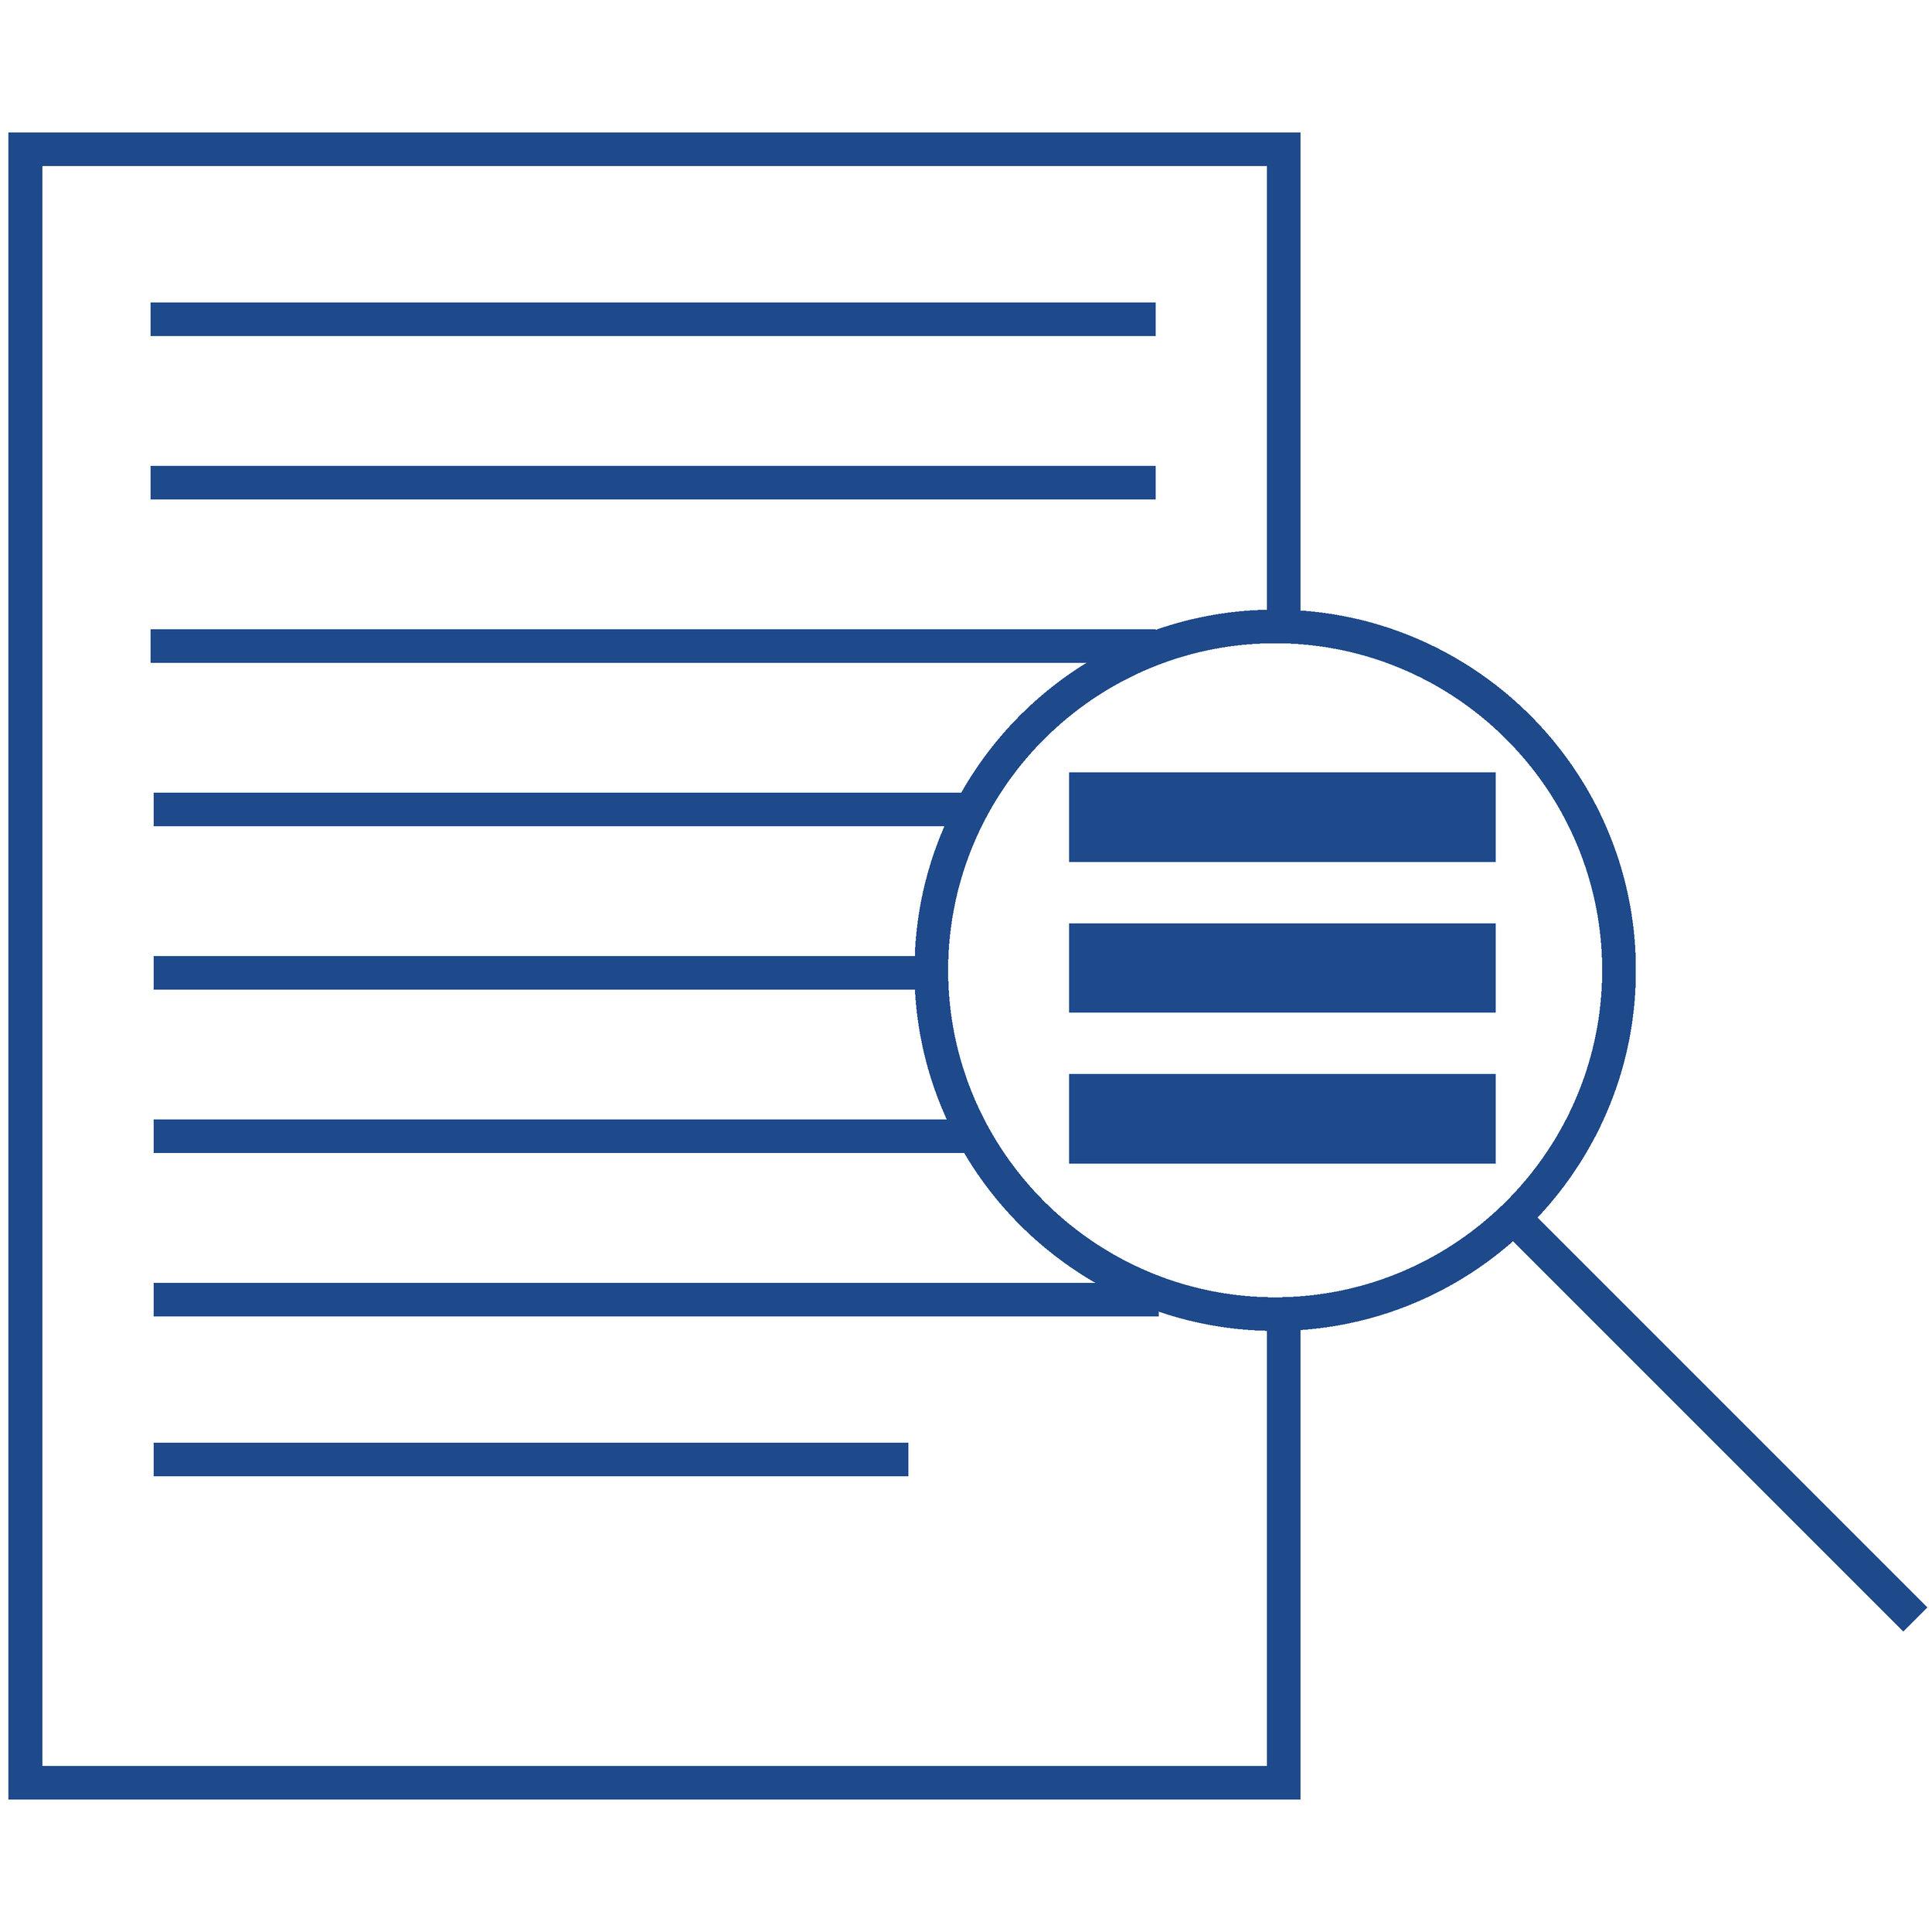 Programme Assurance  & Risk Assessment